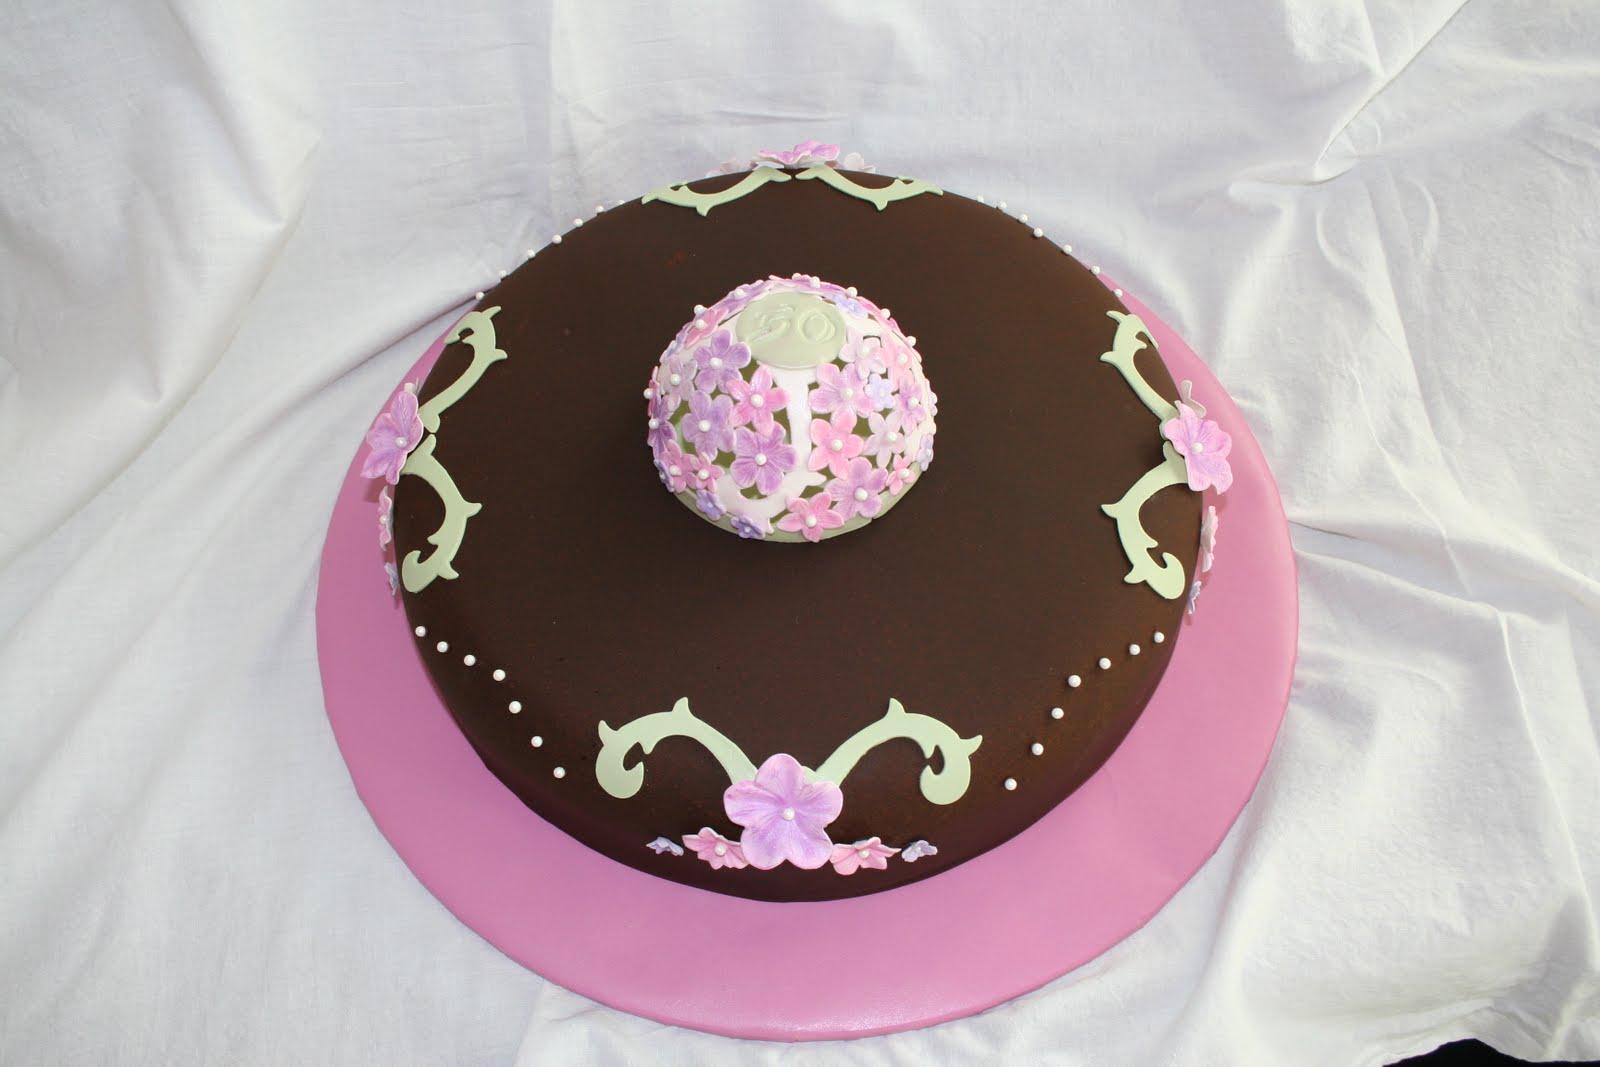 Cake Decorating Classes Santa Cruz